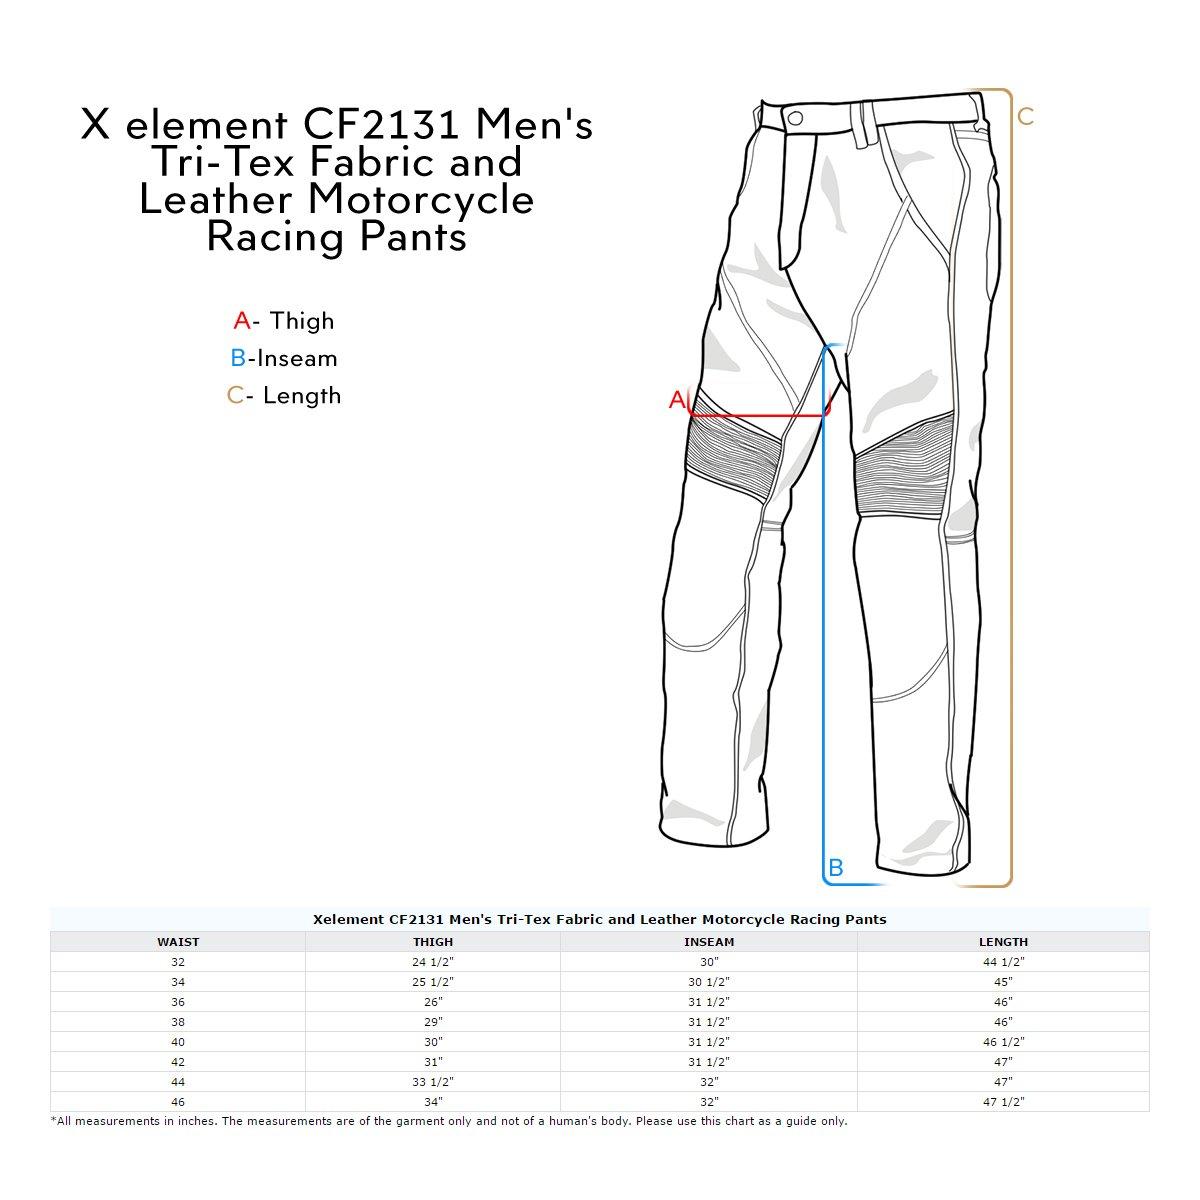 Xelement CF2131 Mens Black Tri-Tex/Leather Motorcycle Racing Pants - 40